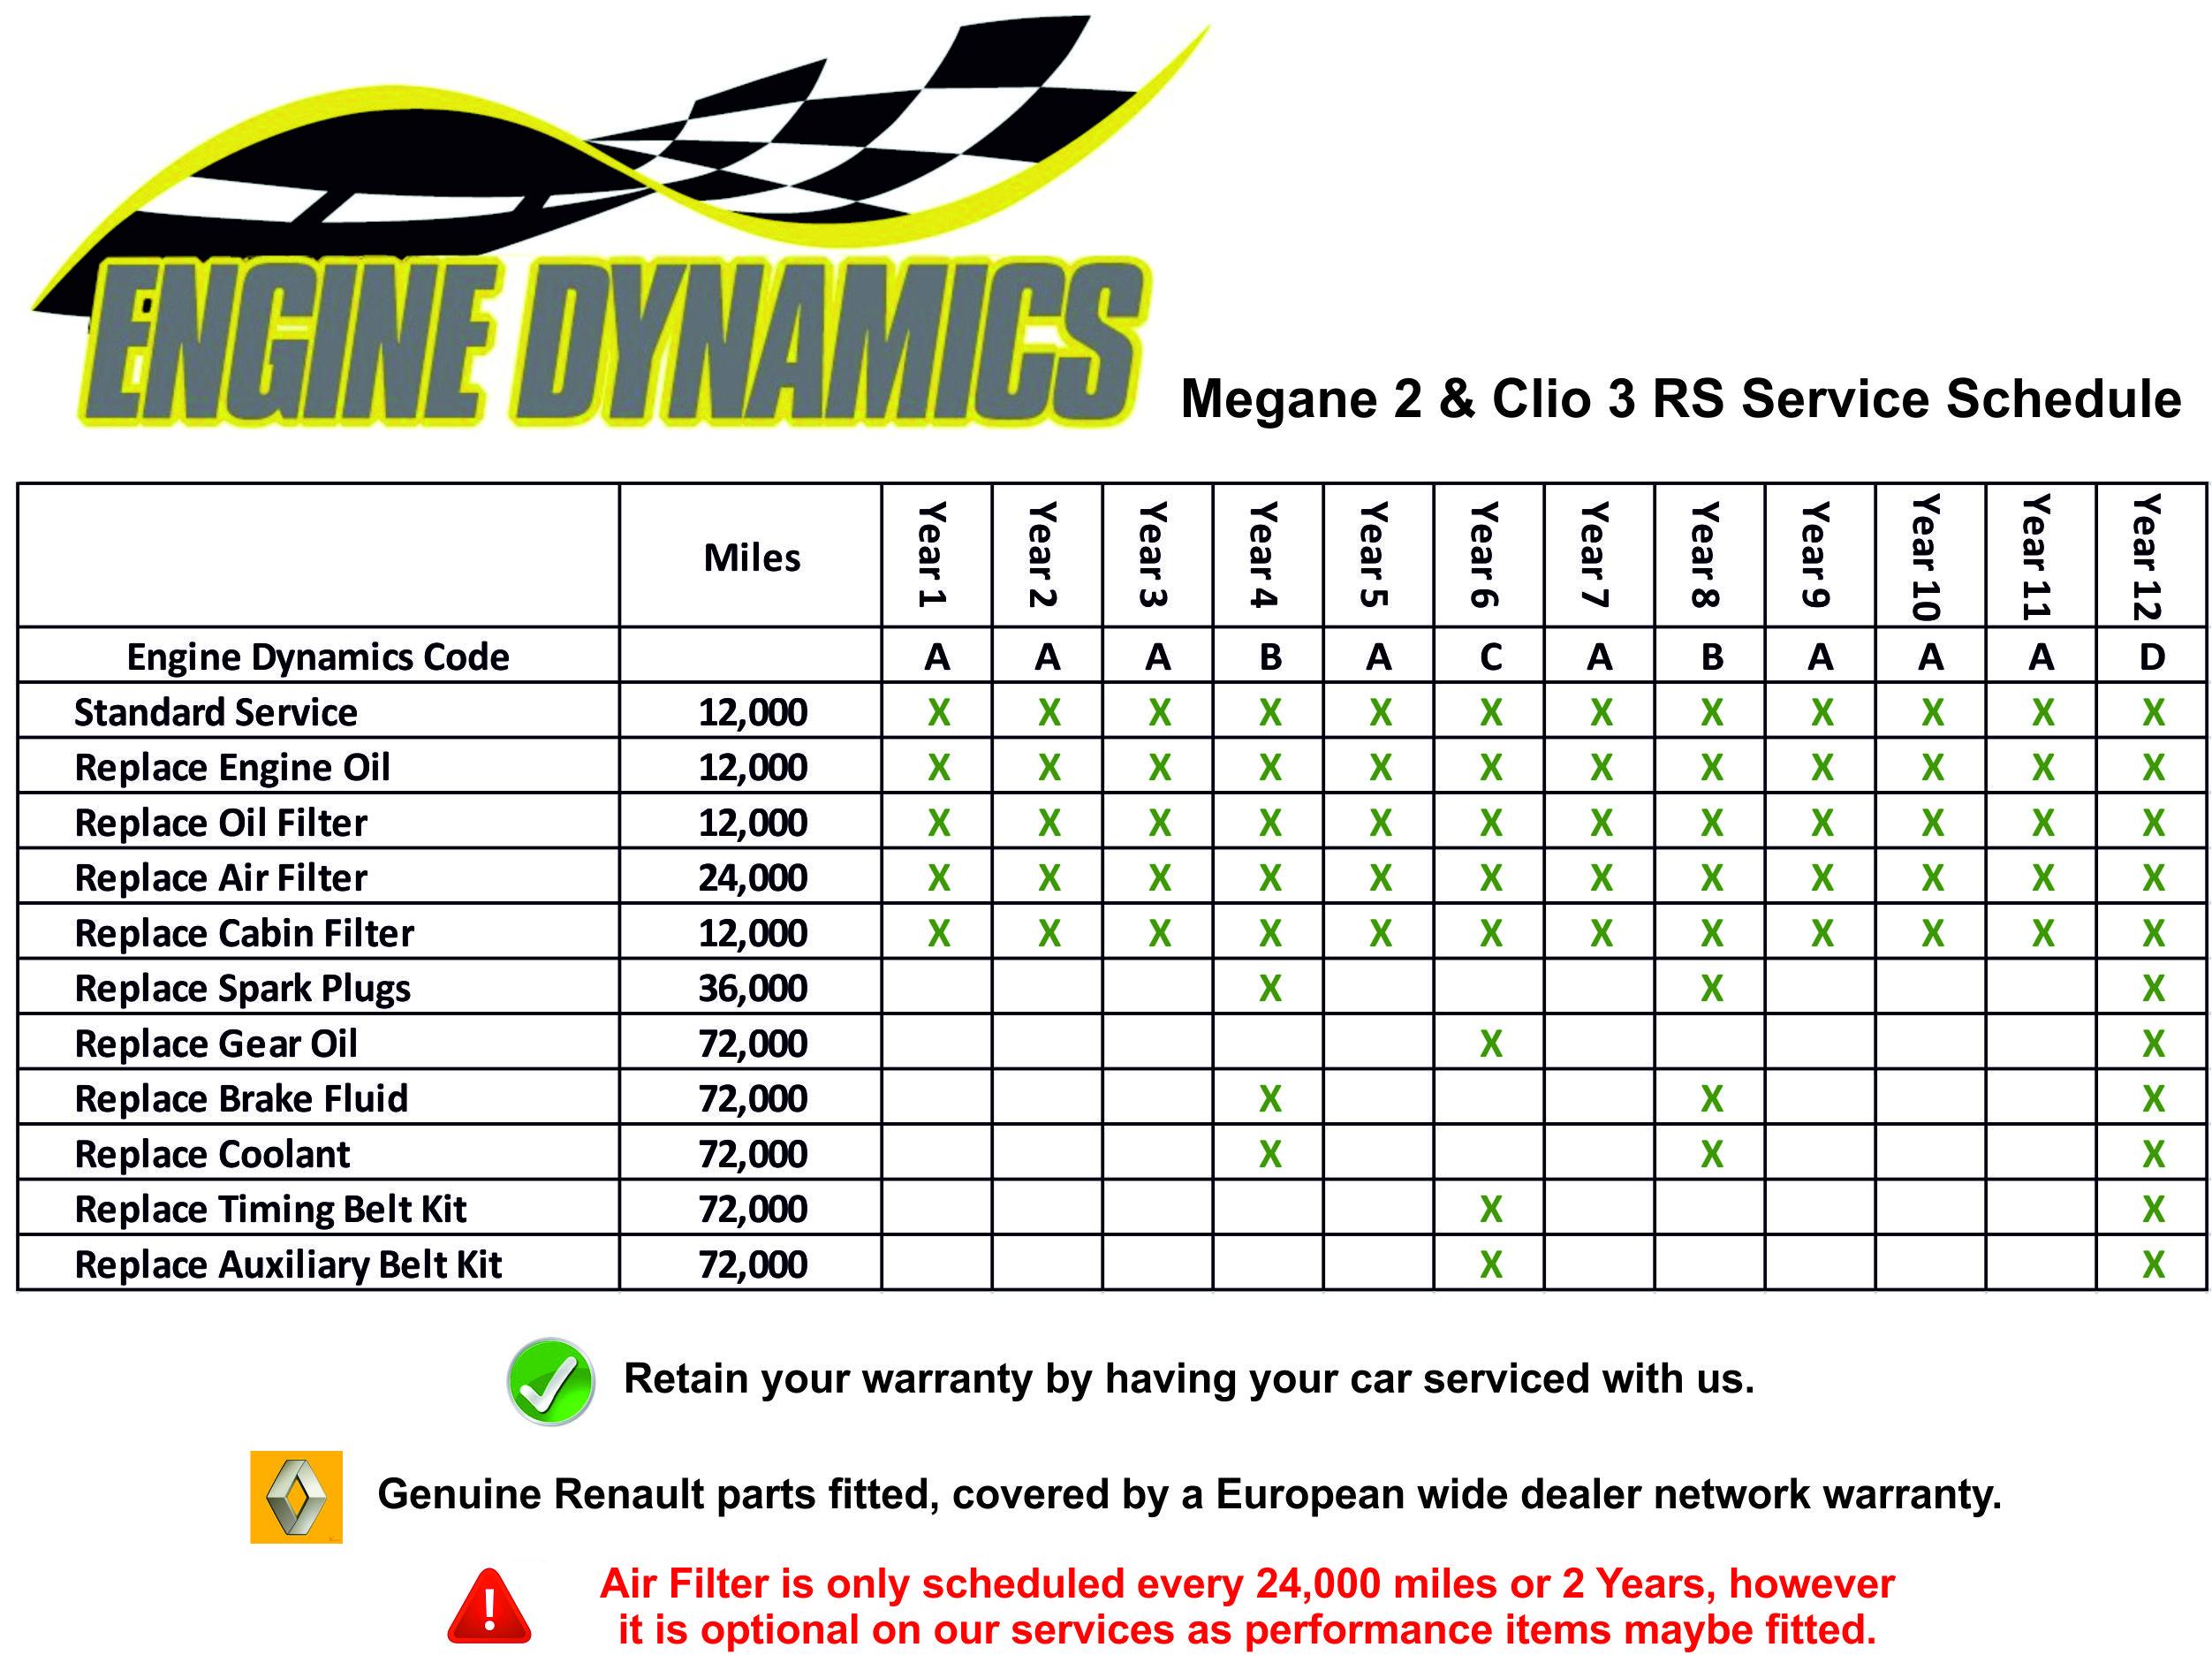 Servicing Timing Belts Vehicle Service Code B Renault Belt Engine Dynamics Codes